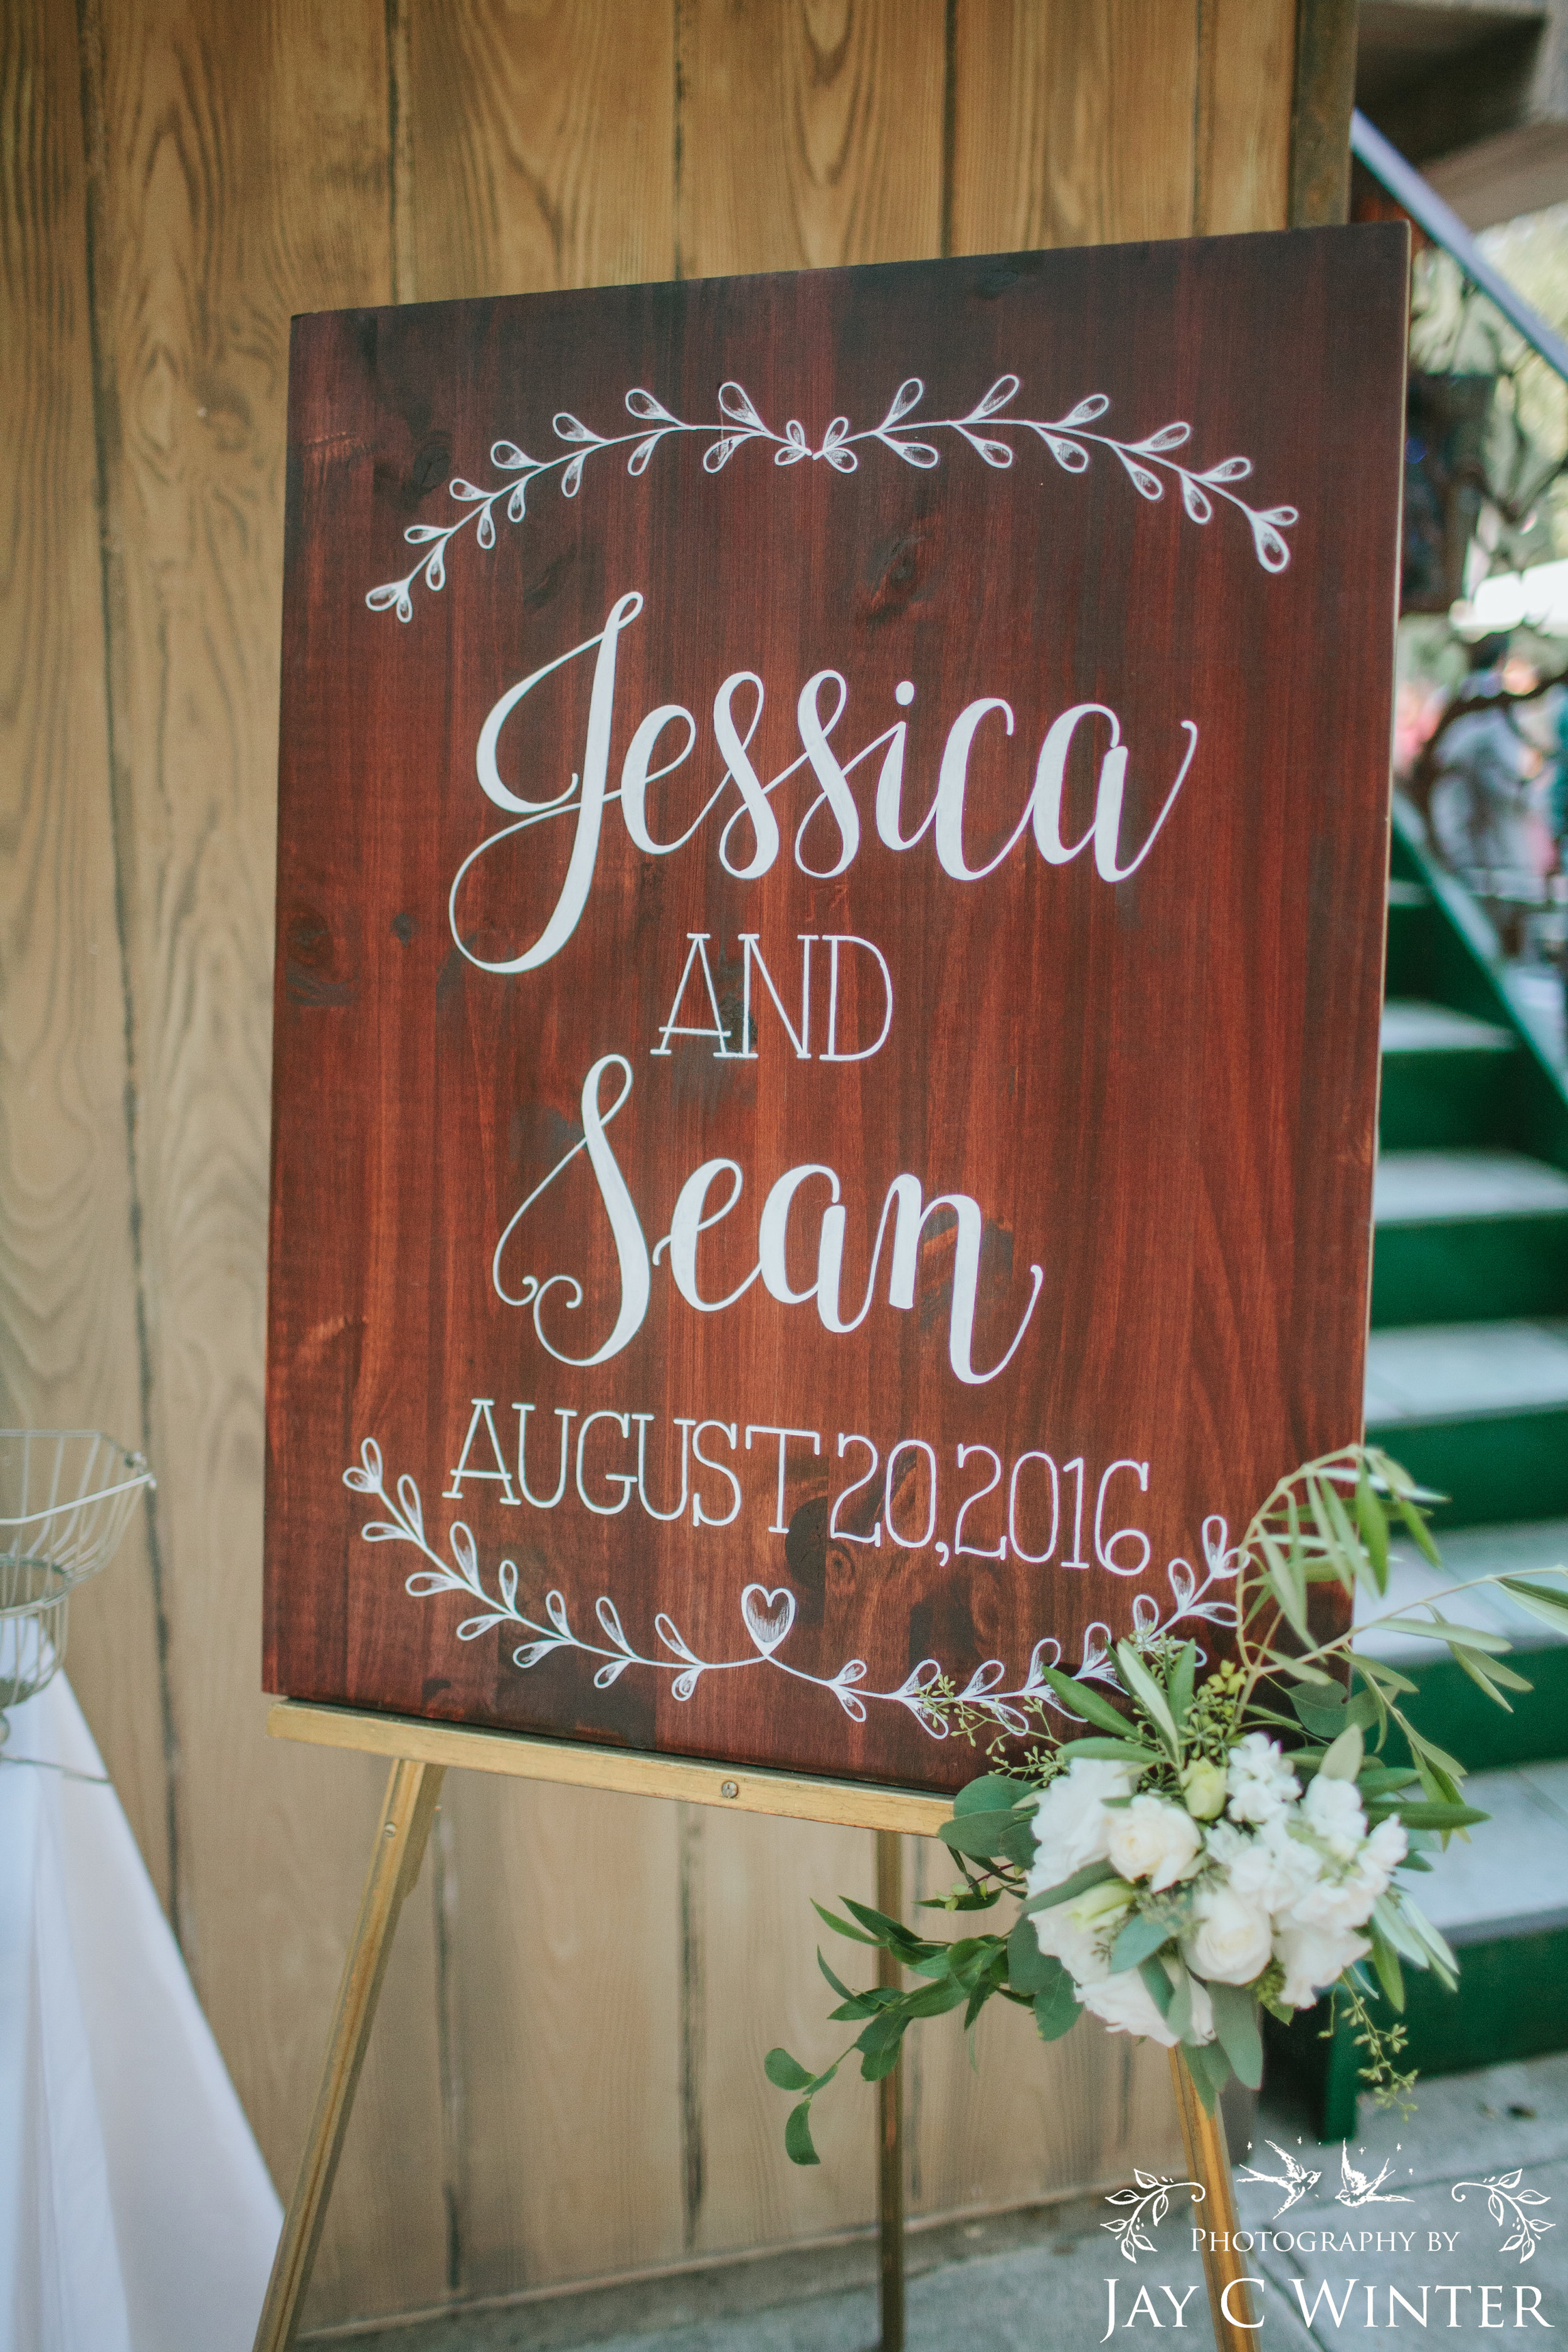 875-Jessica+Sean (1).jpg